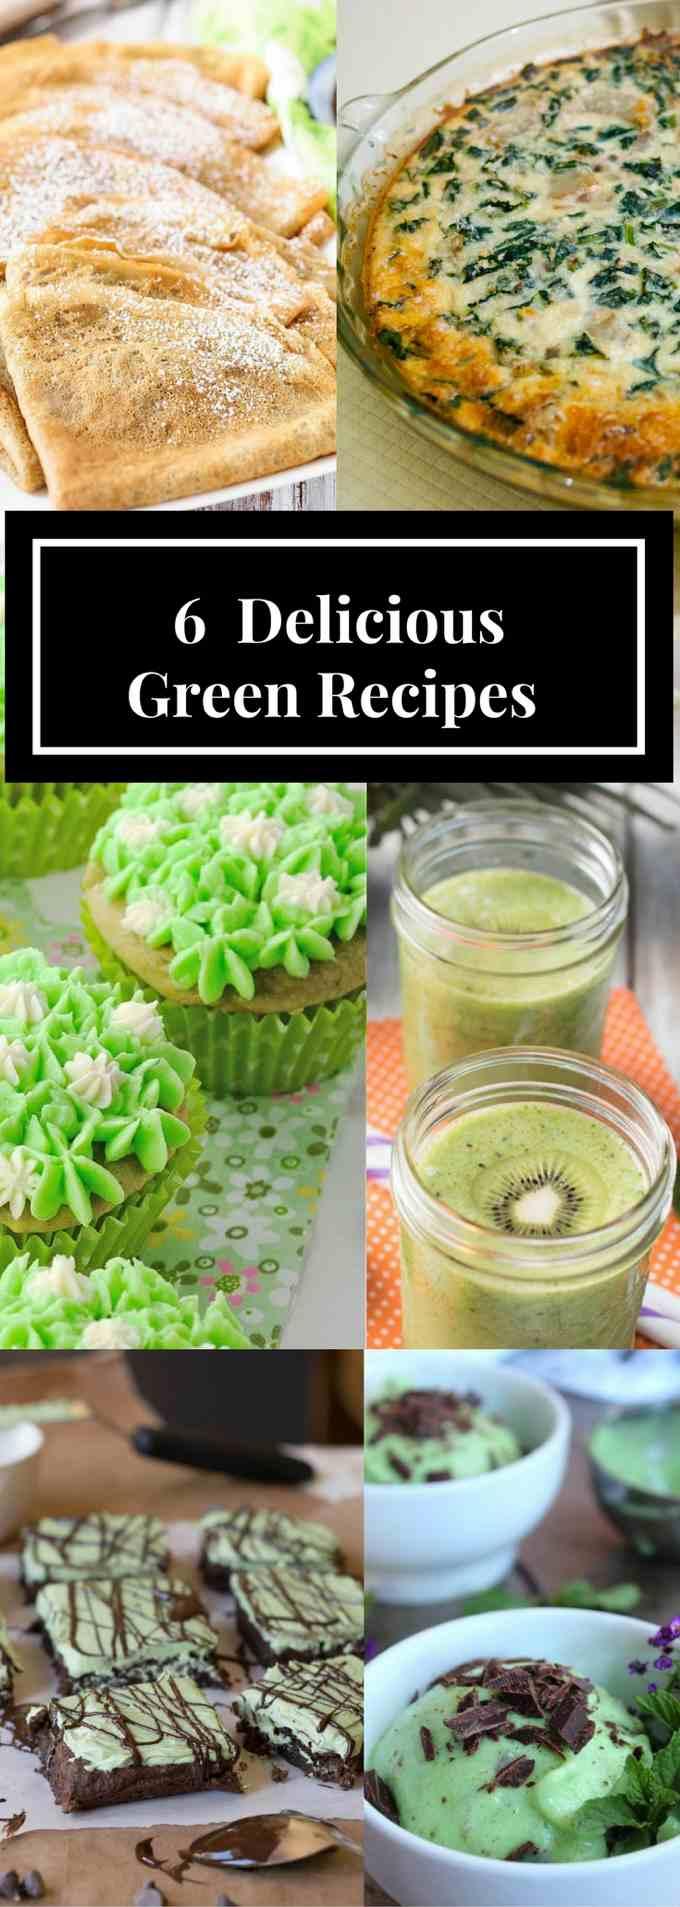 #FoodBlogGenius March Collaboration - Green Recipes